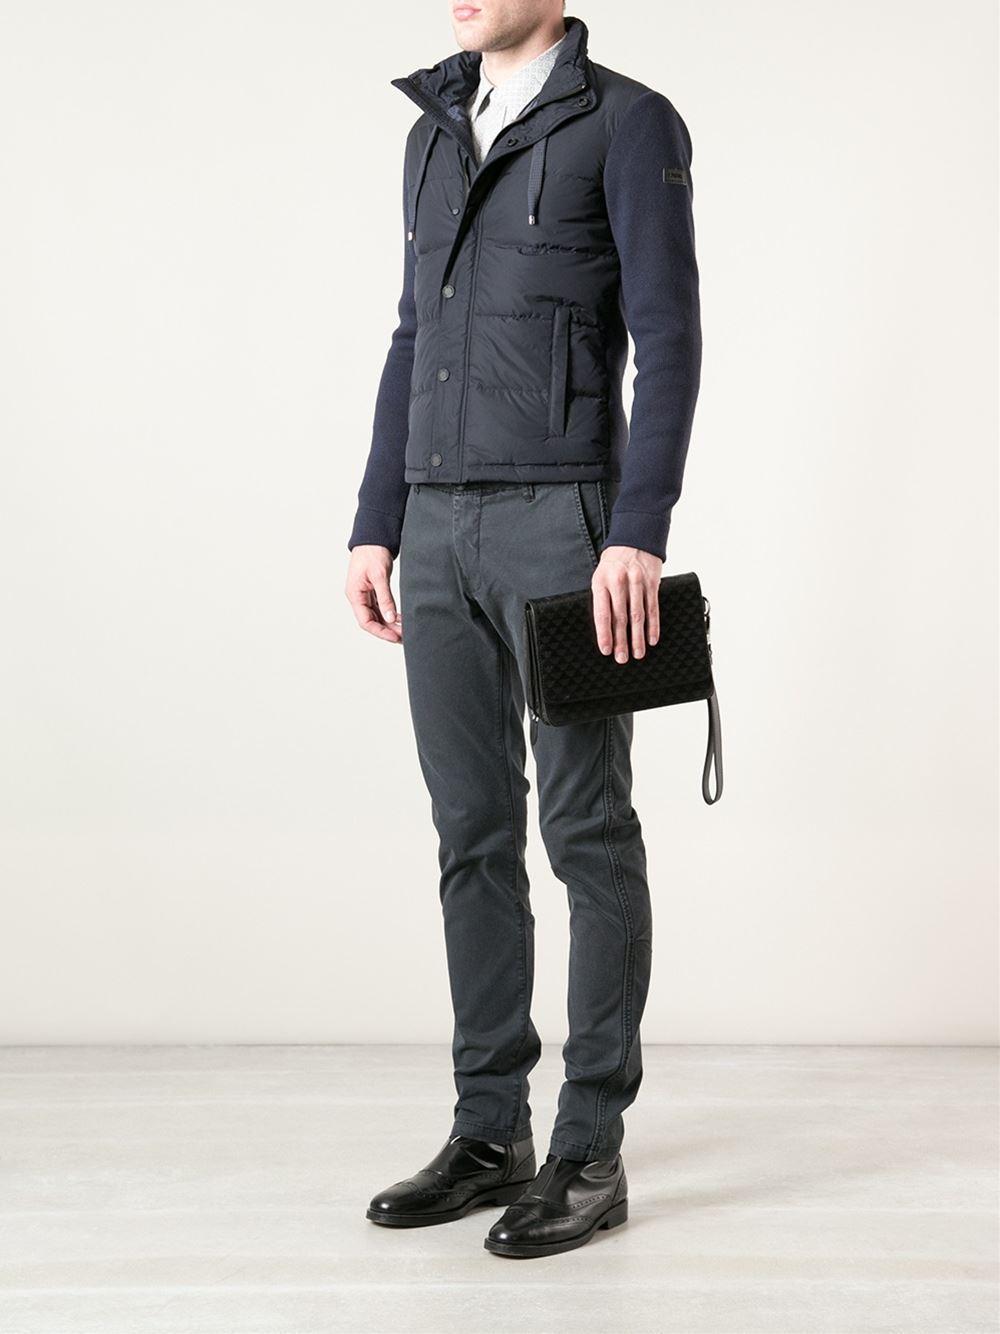 Lyst Emporio Armani Clutch Bag In Black For Men